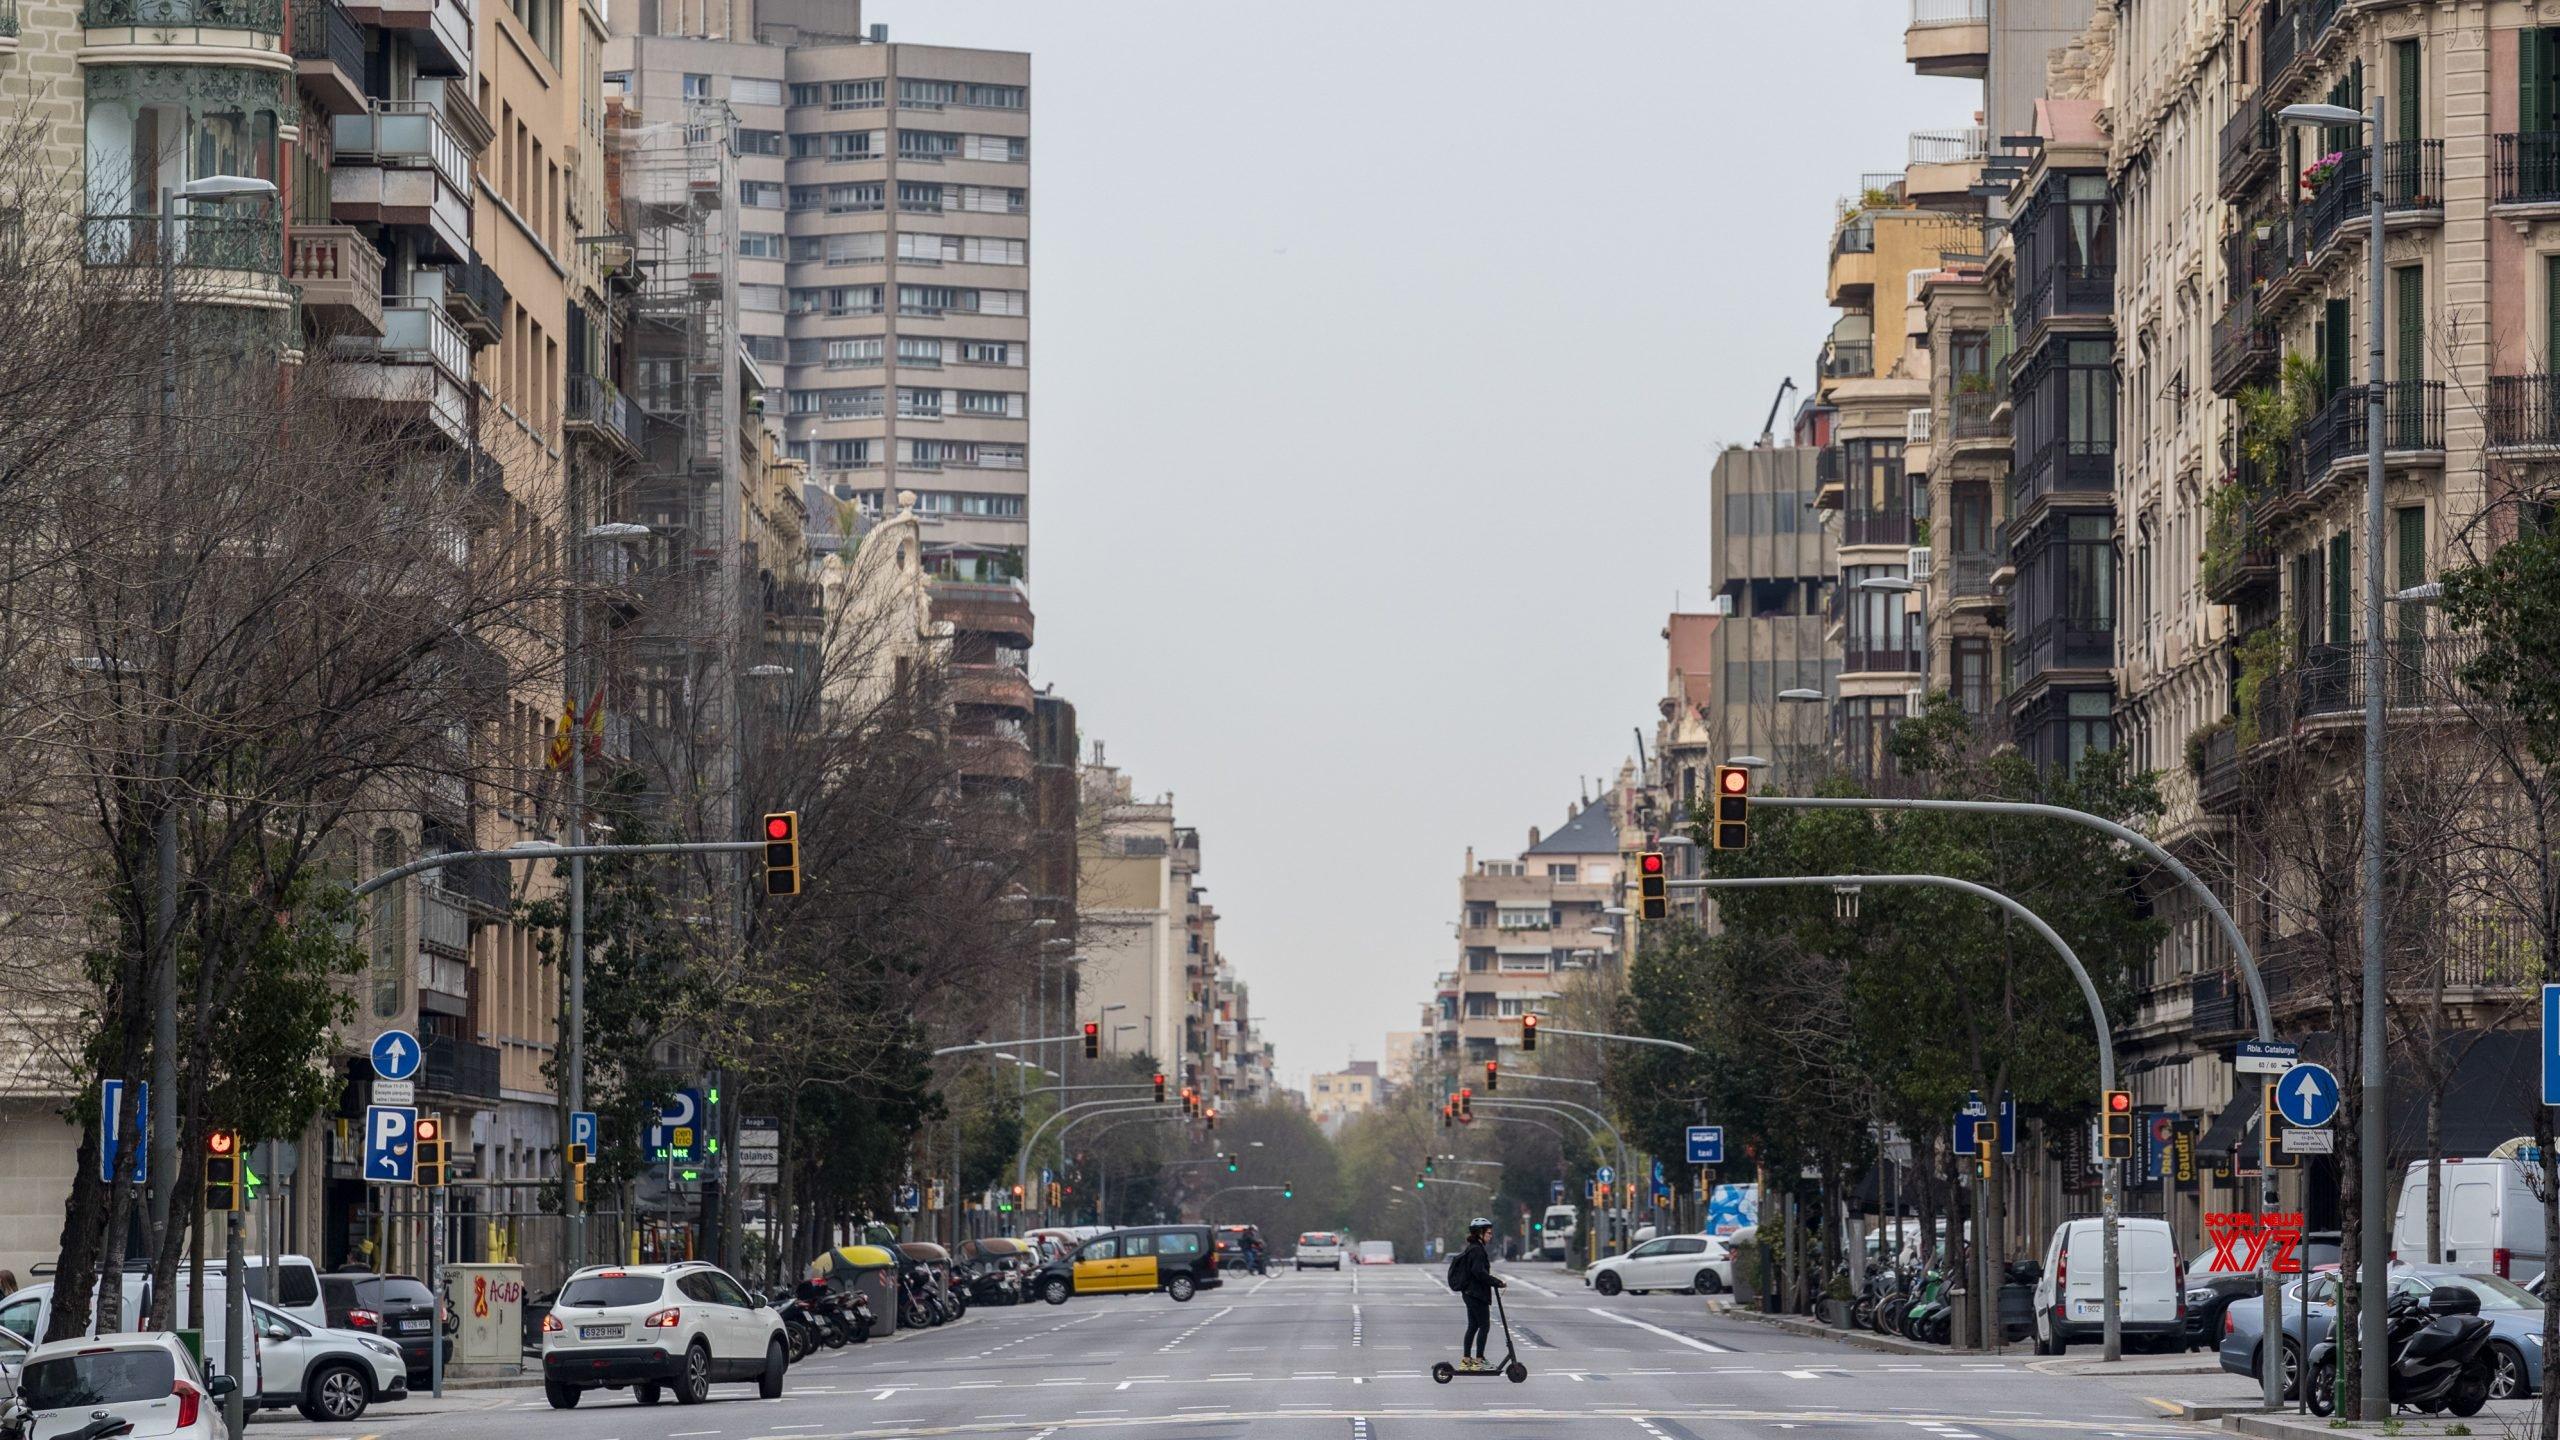 Spain's Deputy PM tests positive for coronavirus